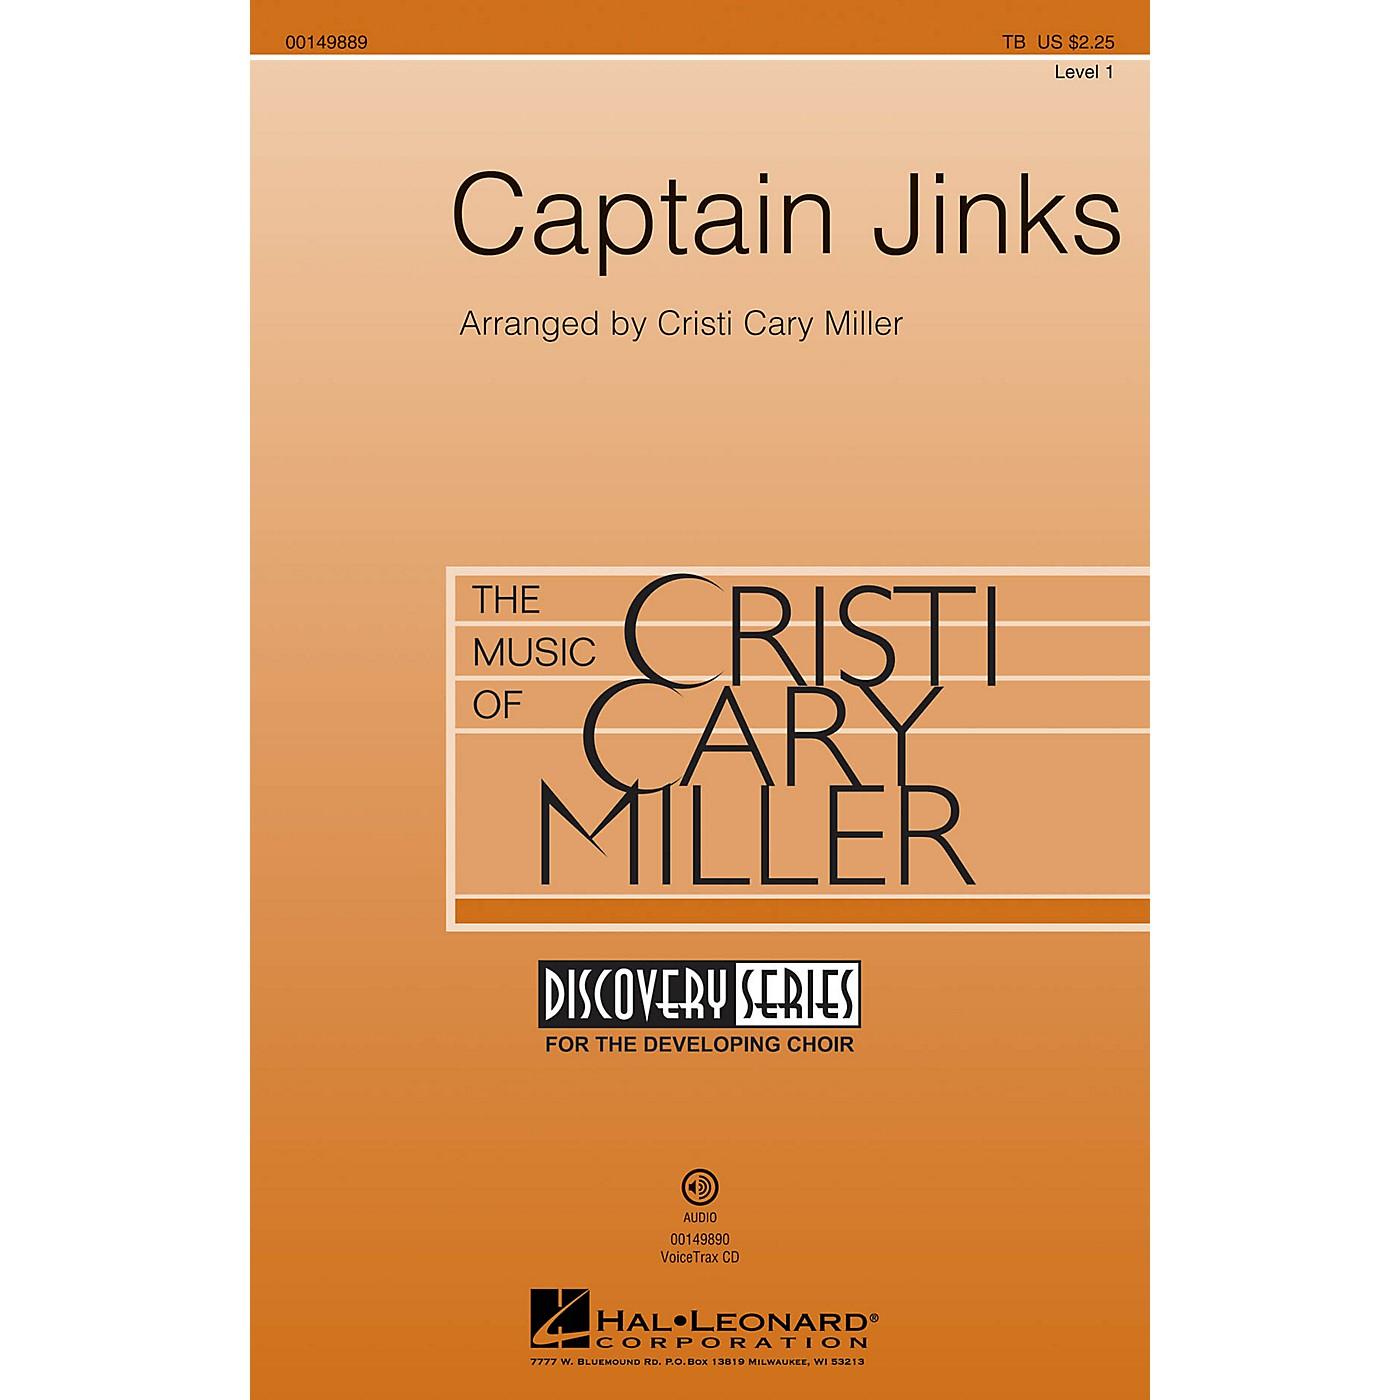 Hal Leonard Captain Jinks (Discovery Level 1) VoiceTrax CD Arranged by Cristi Cary Miller thumbnail